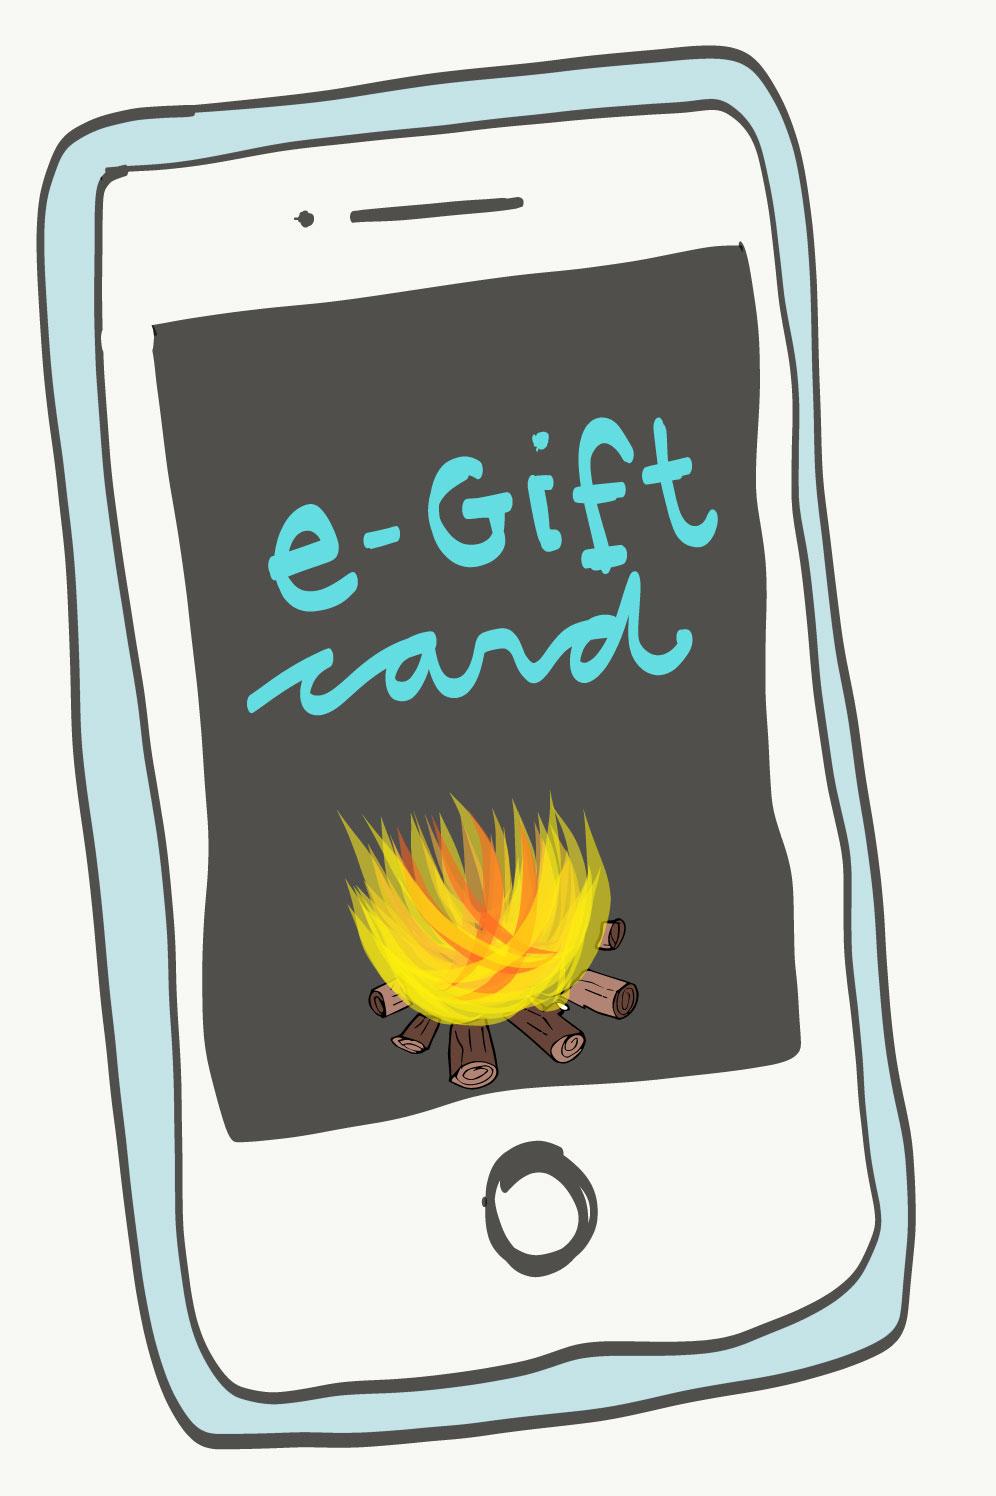 egiftcardfire.jpg